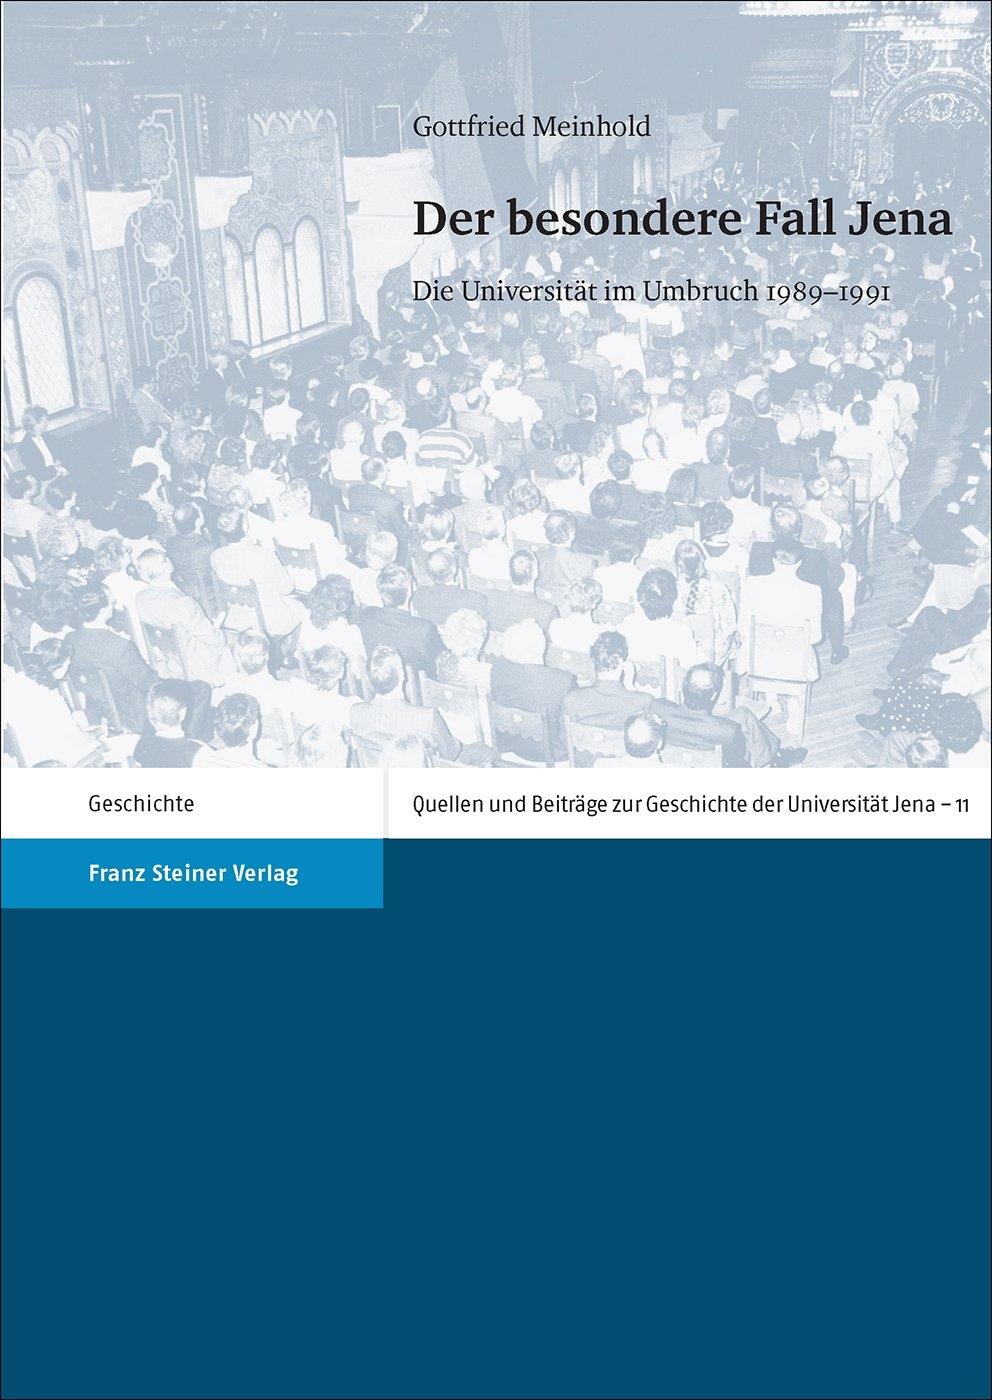 der-besondere-fall-jena-48272